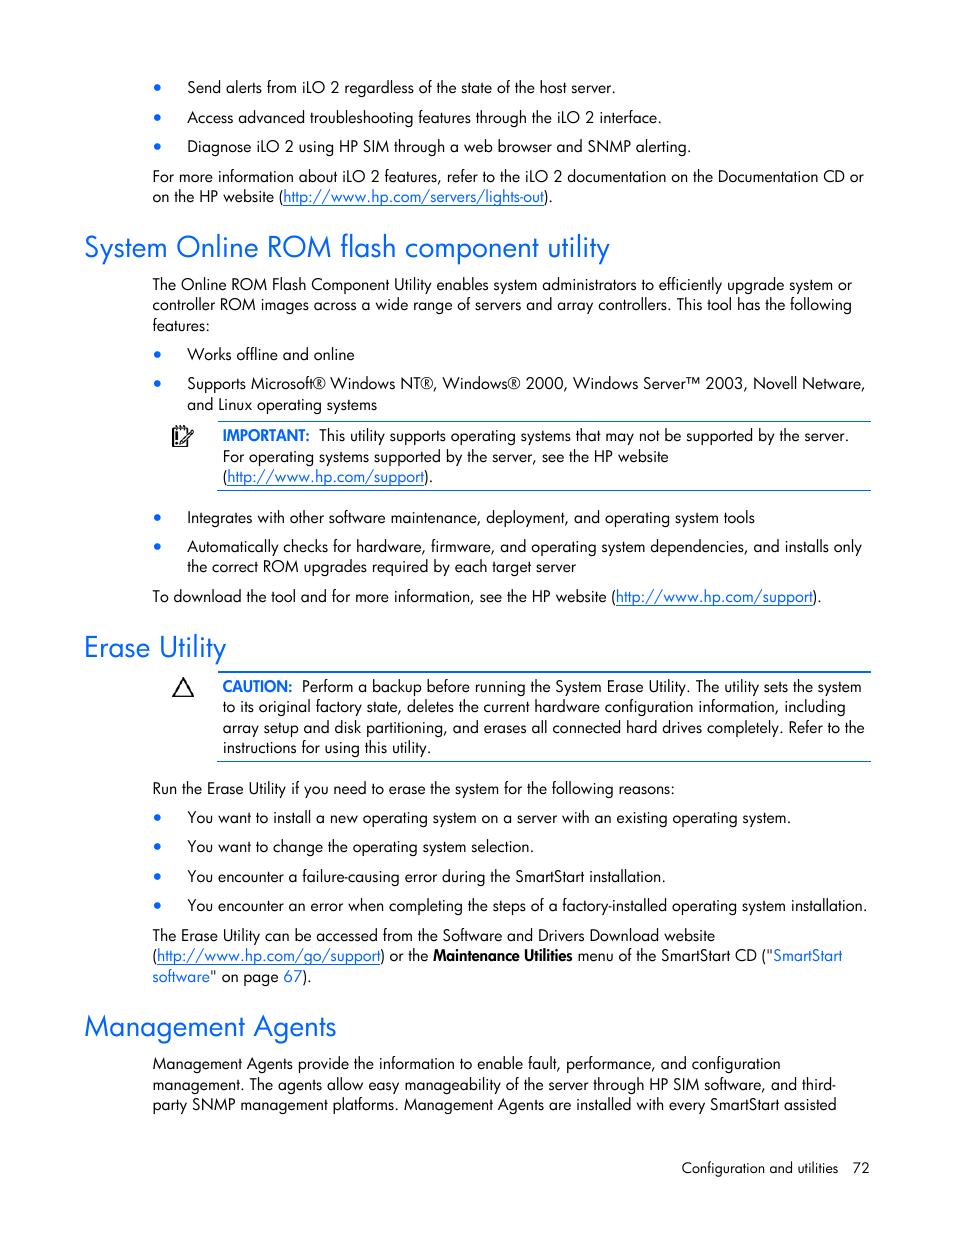 System online rom flash component utility, Erase utility, Management